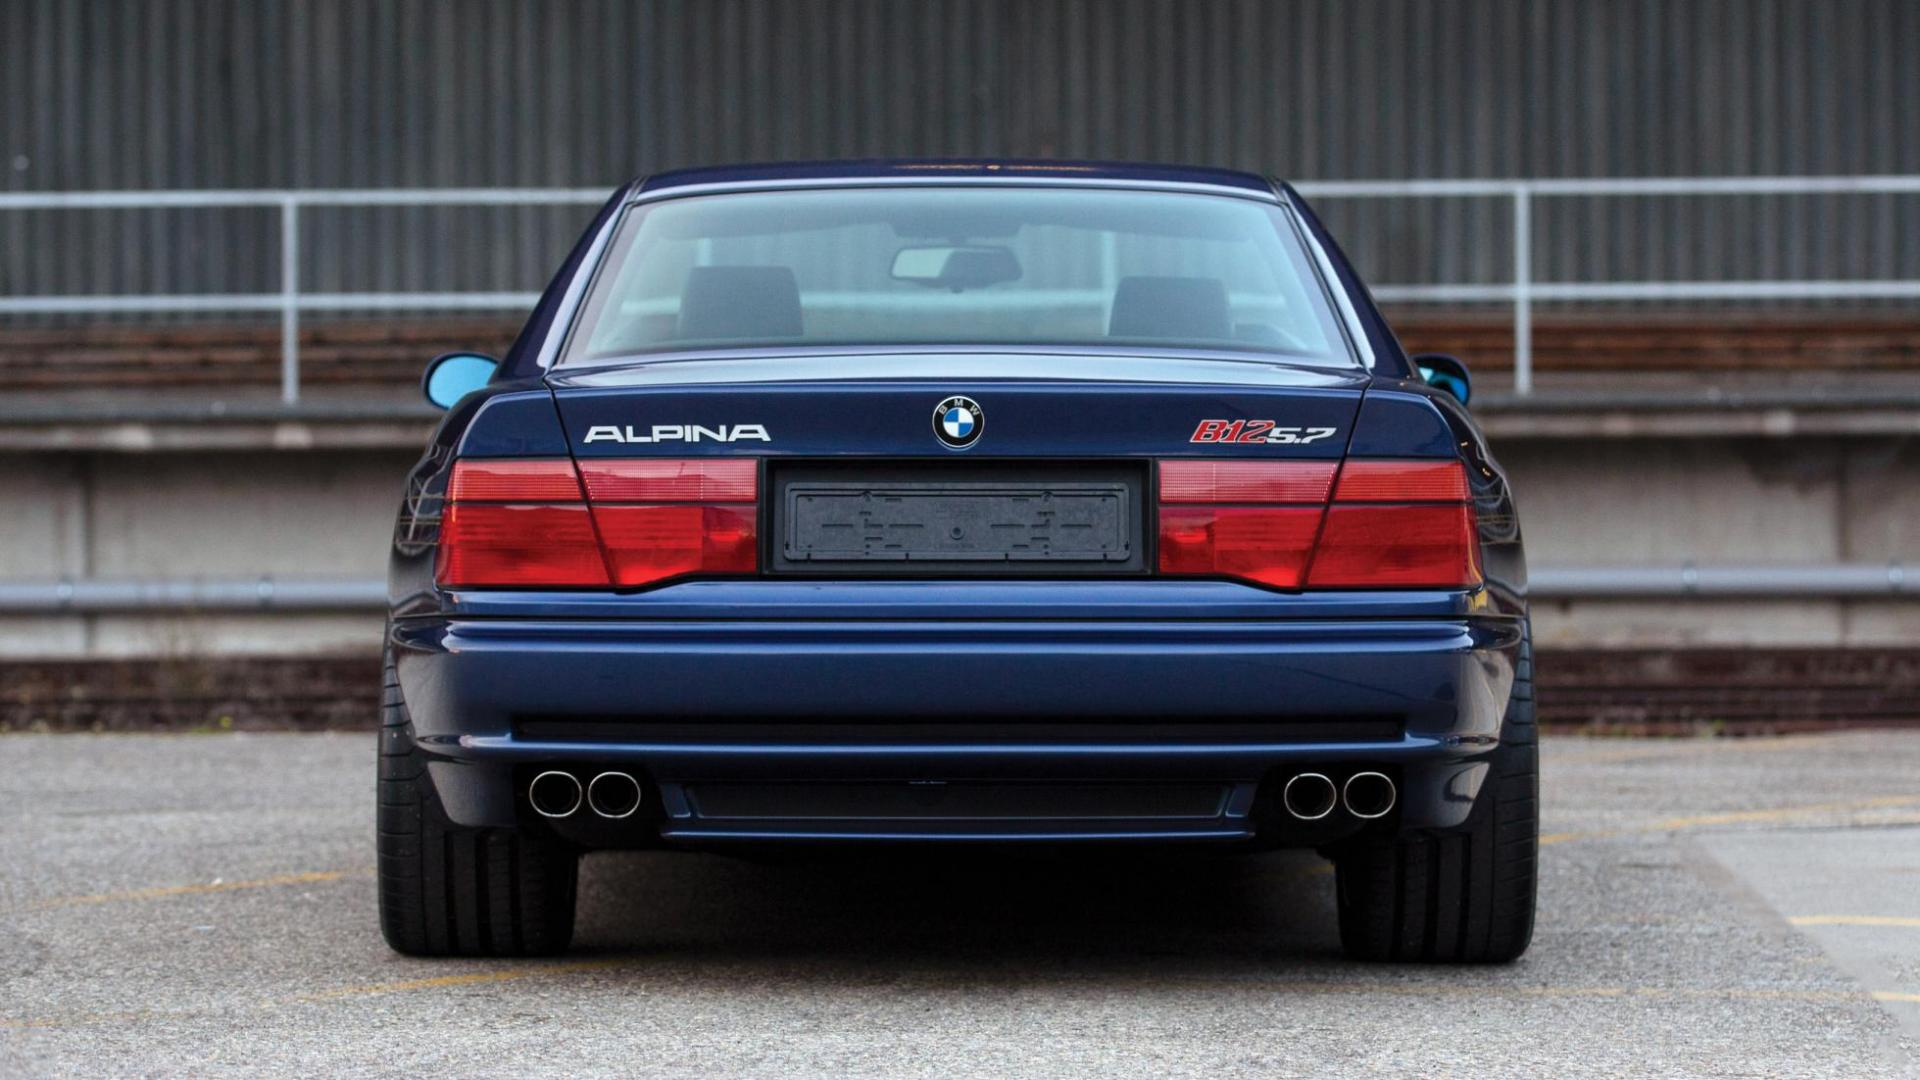 Alpina BMW B12 5